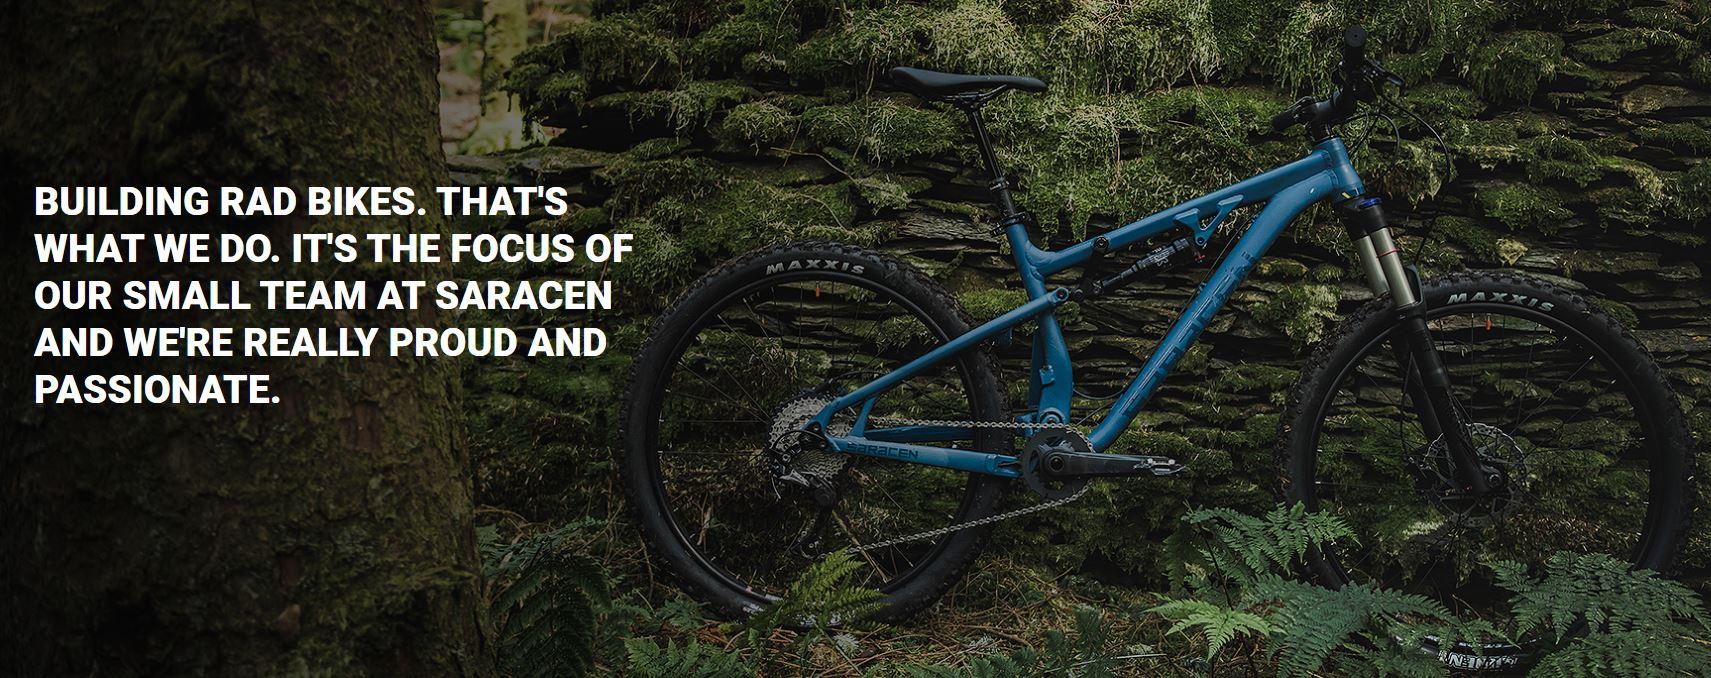 saracen-bikes-banner.jpg